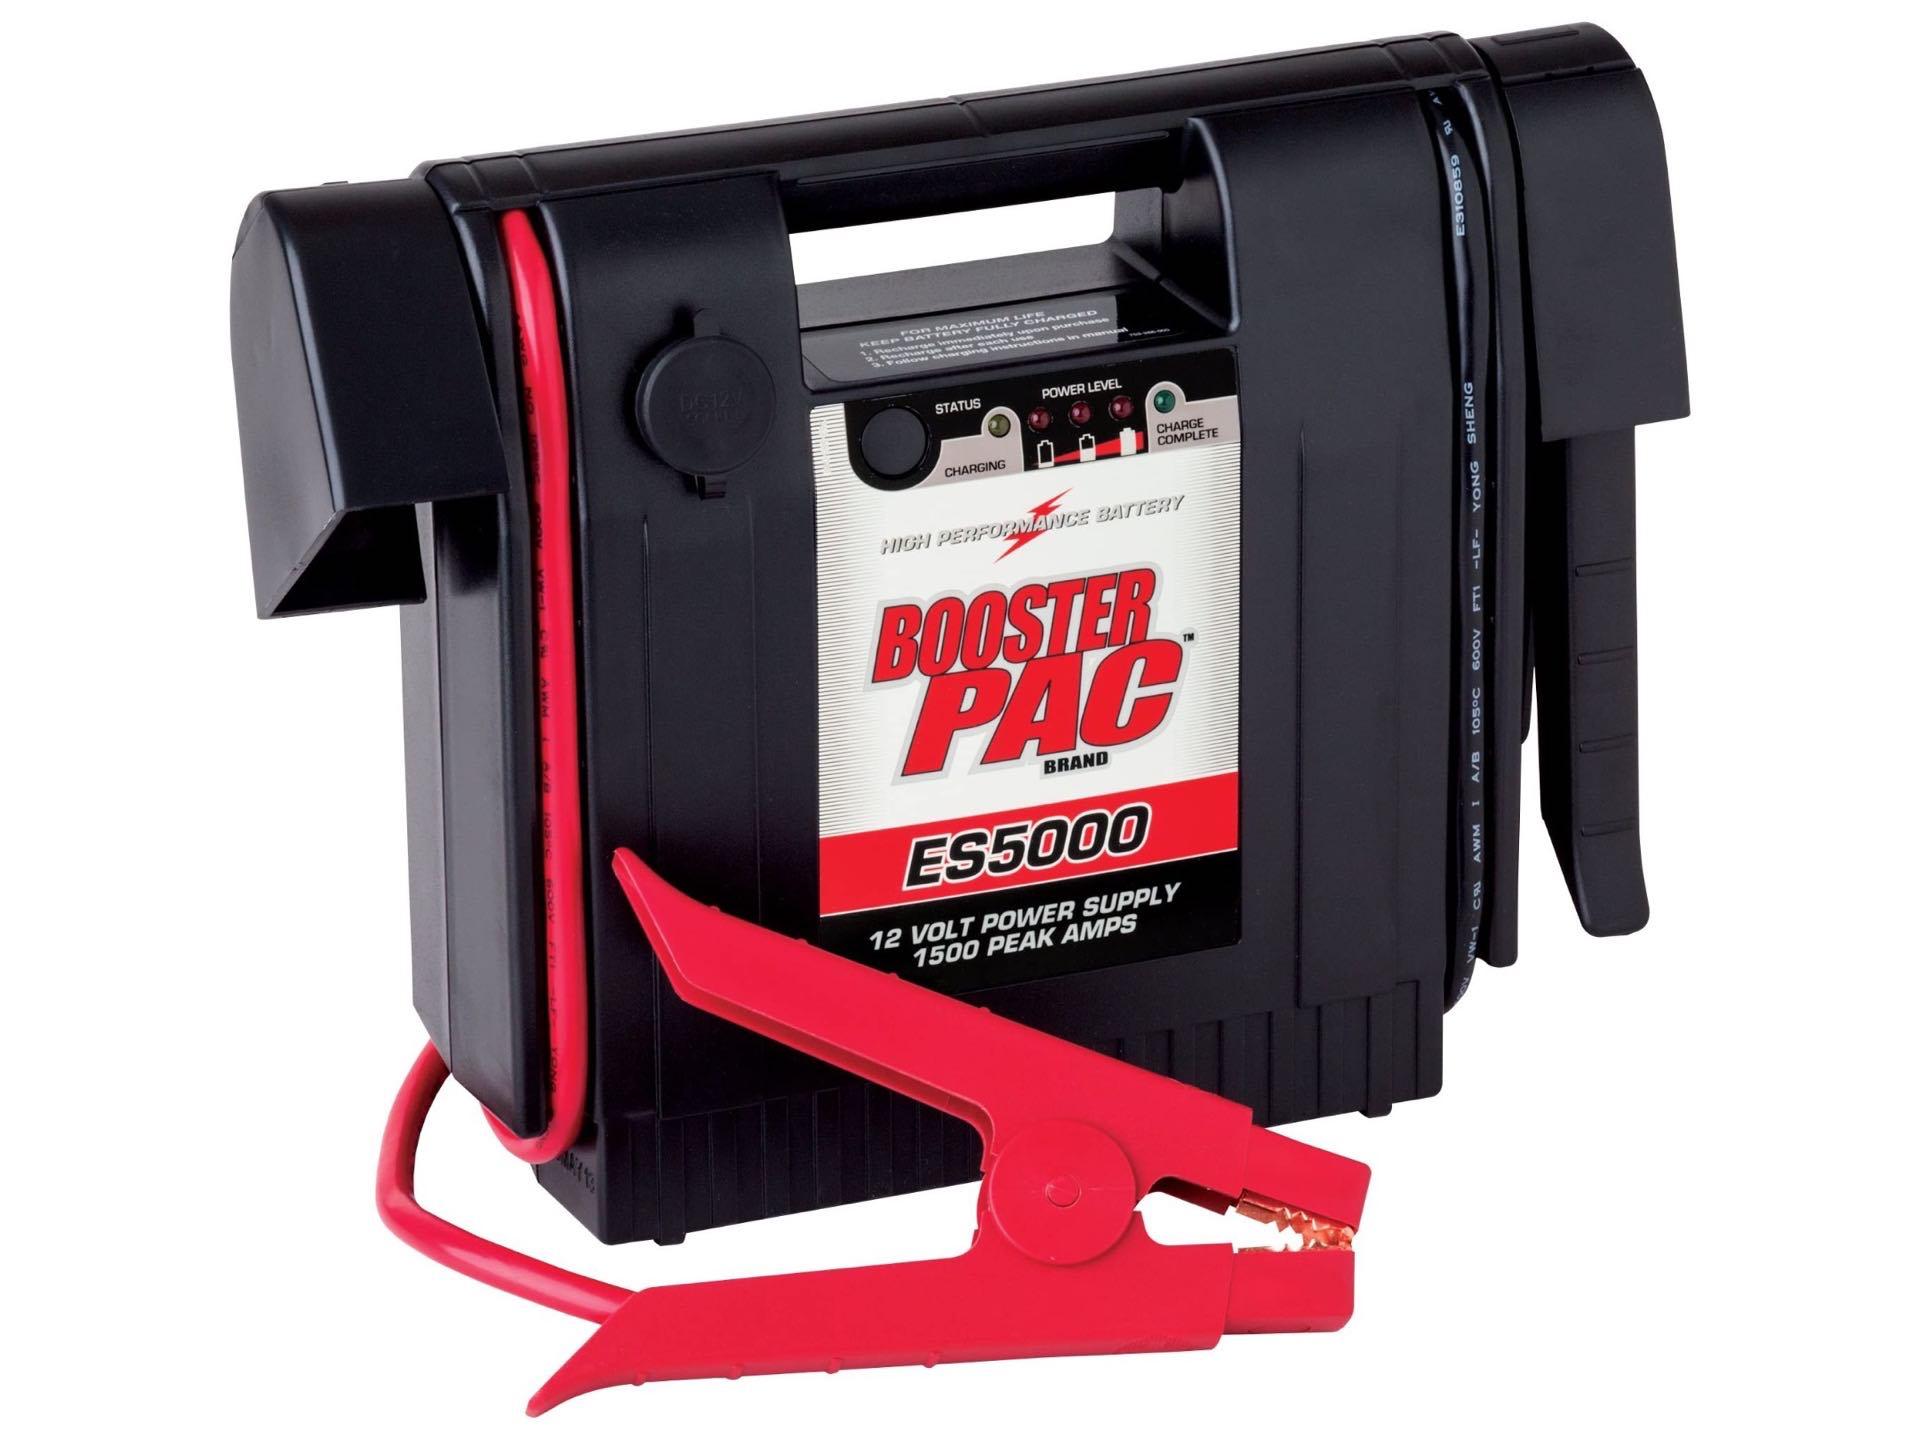 clore-booster-pac-es5000-portable-jump-starter